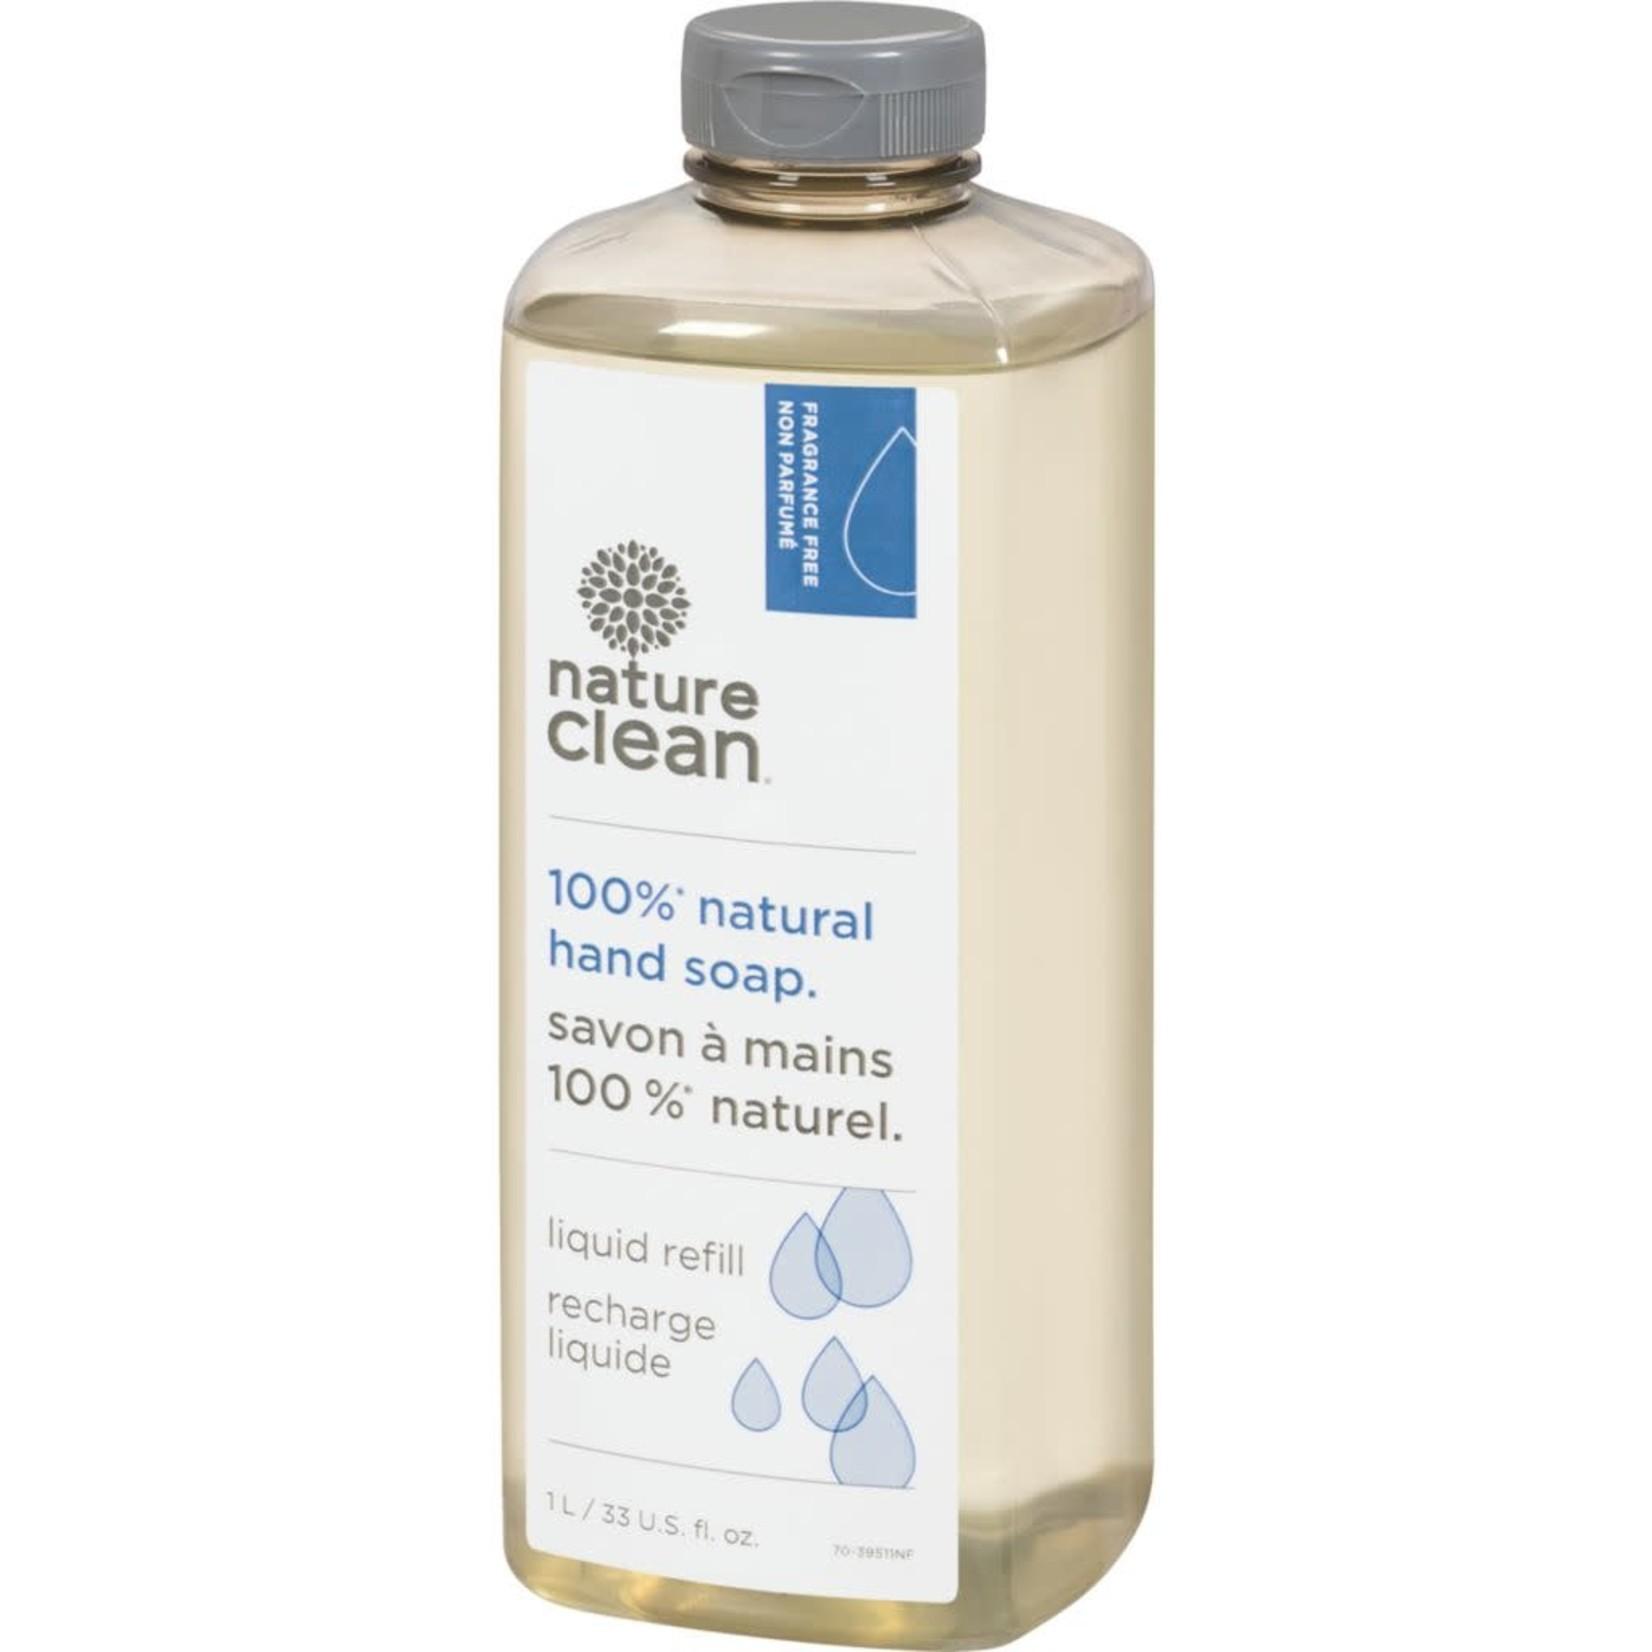 Nature Clean Nature Clean Fragrance Free Hand Soap Liquid Refill 1L